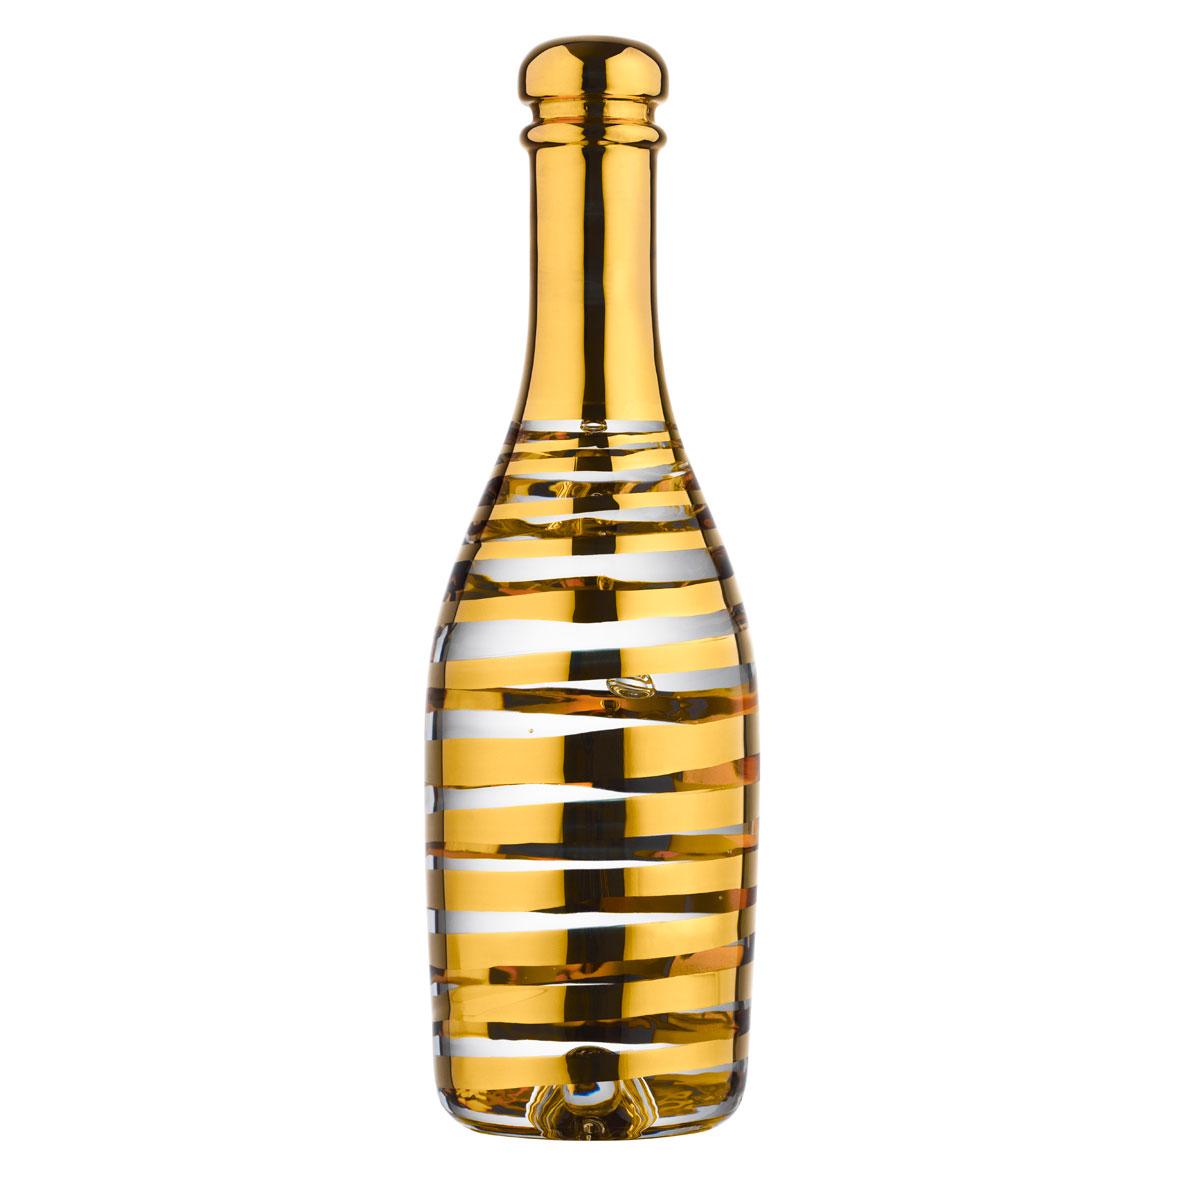 Kosta Boda Celebrate Crystal Champagne Bottle, Gold